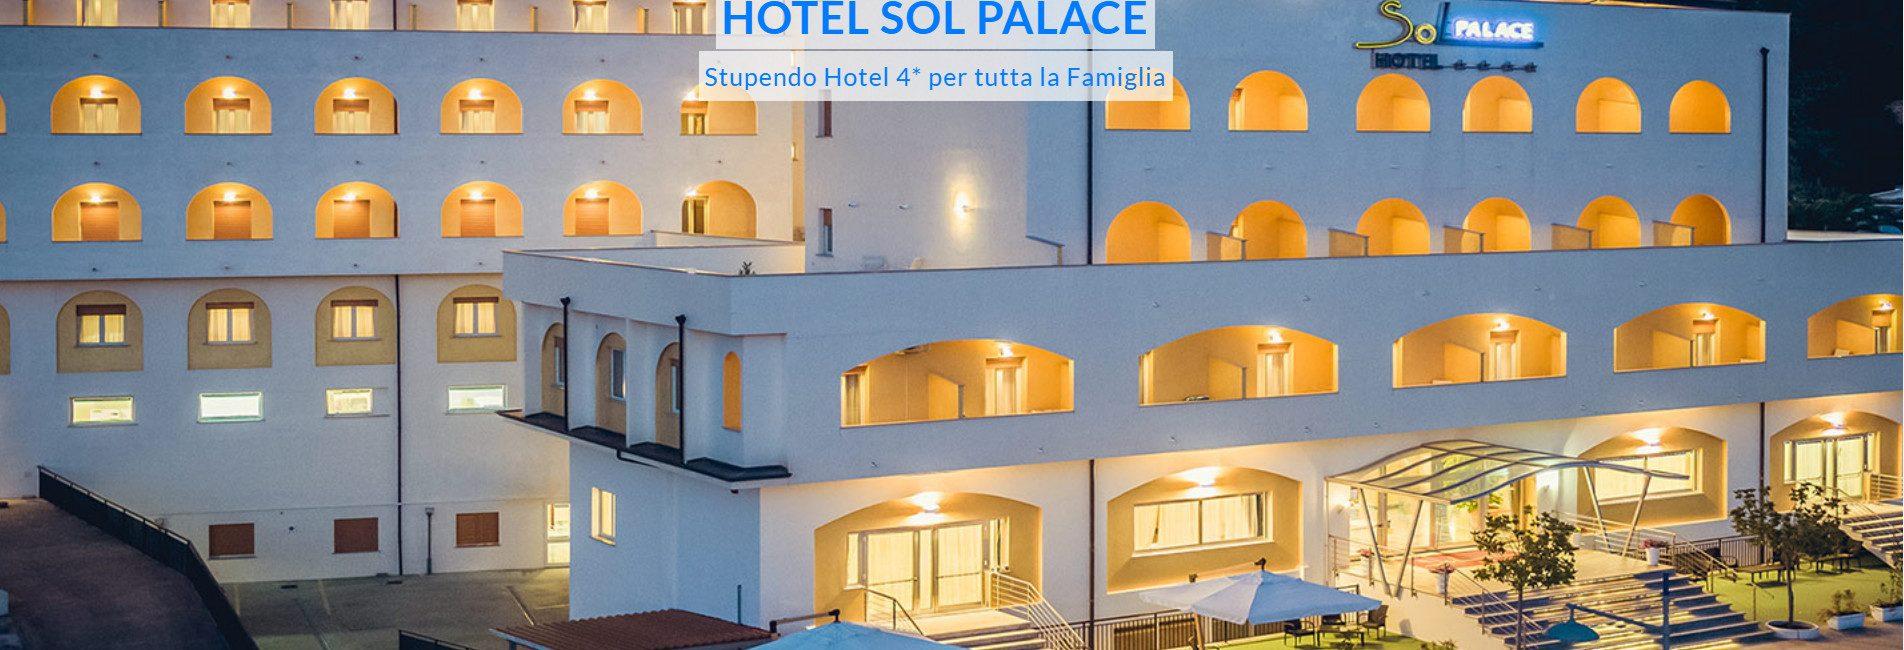 Hotel Sol Palace